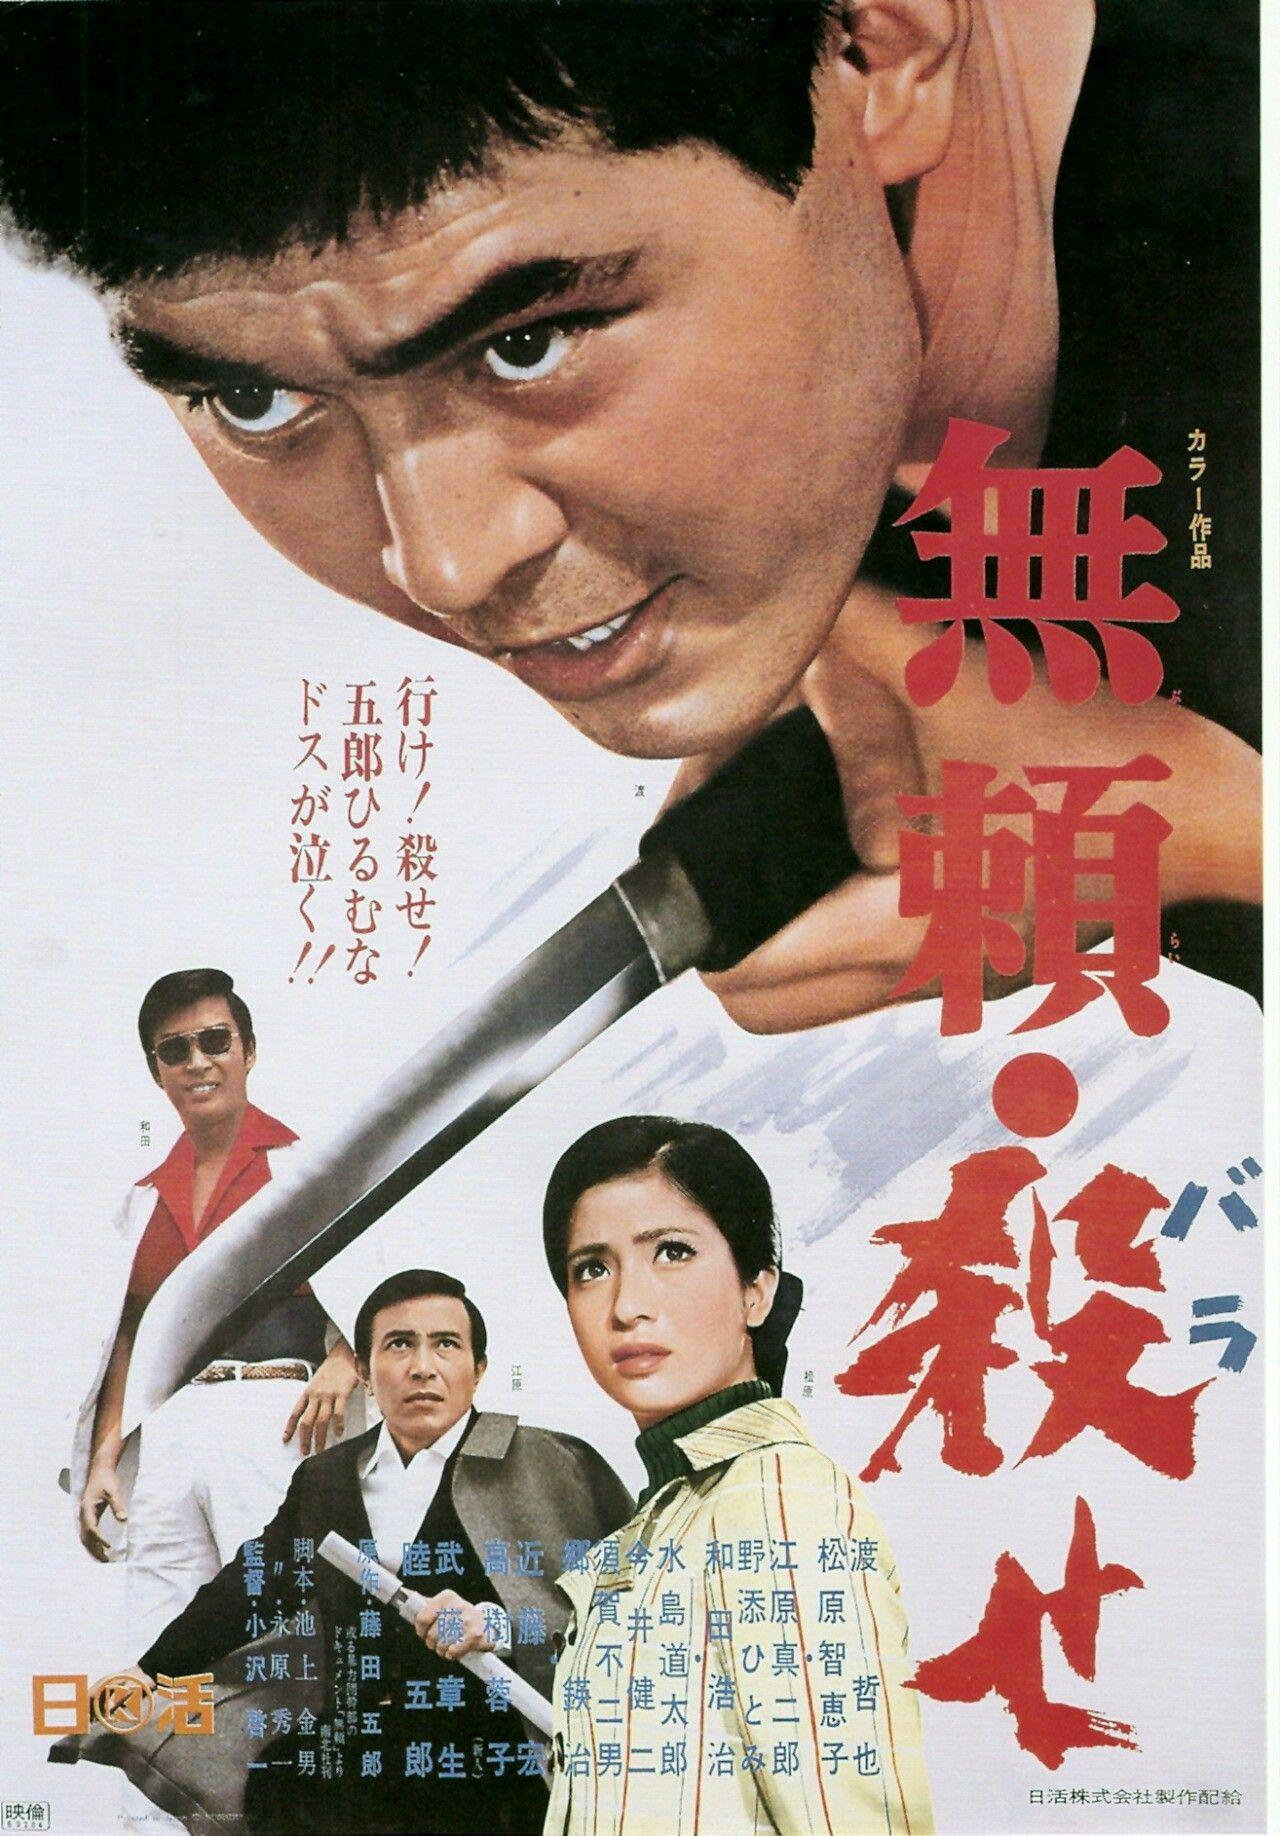 Burai Burase! (Kill!, 1969) 映画 ポスター, アクション映画, 日活